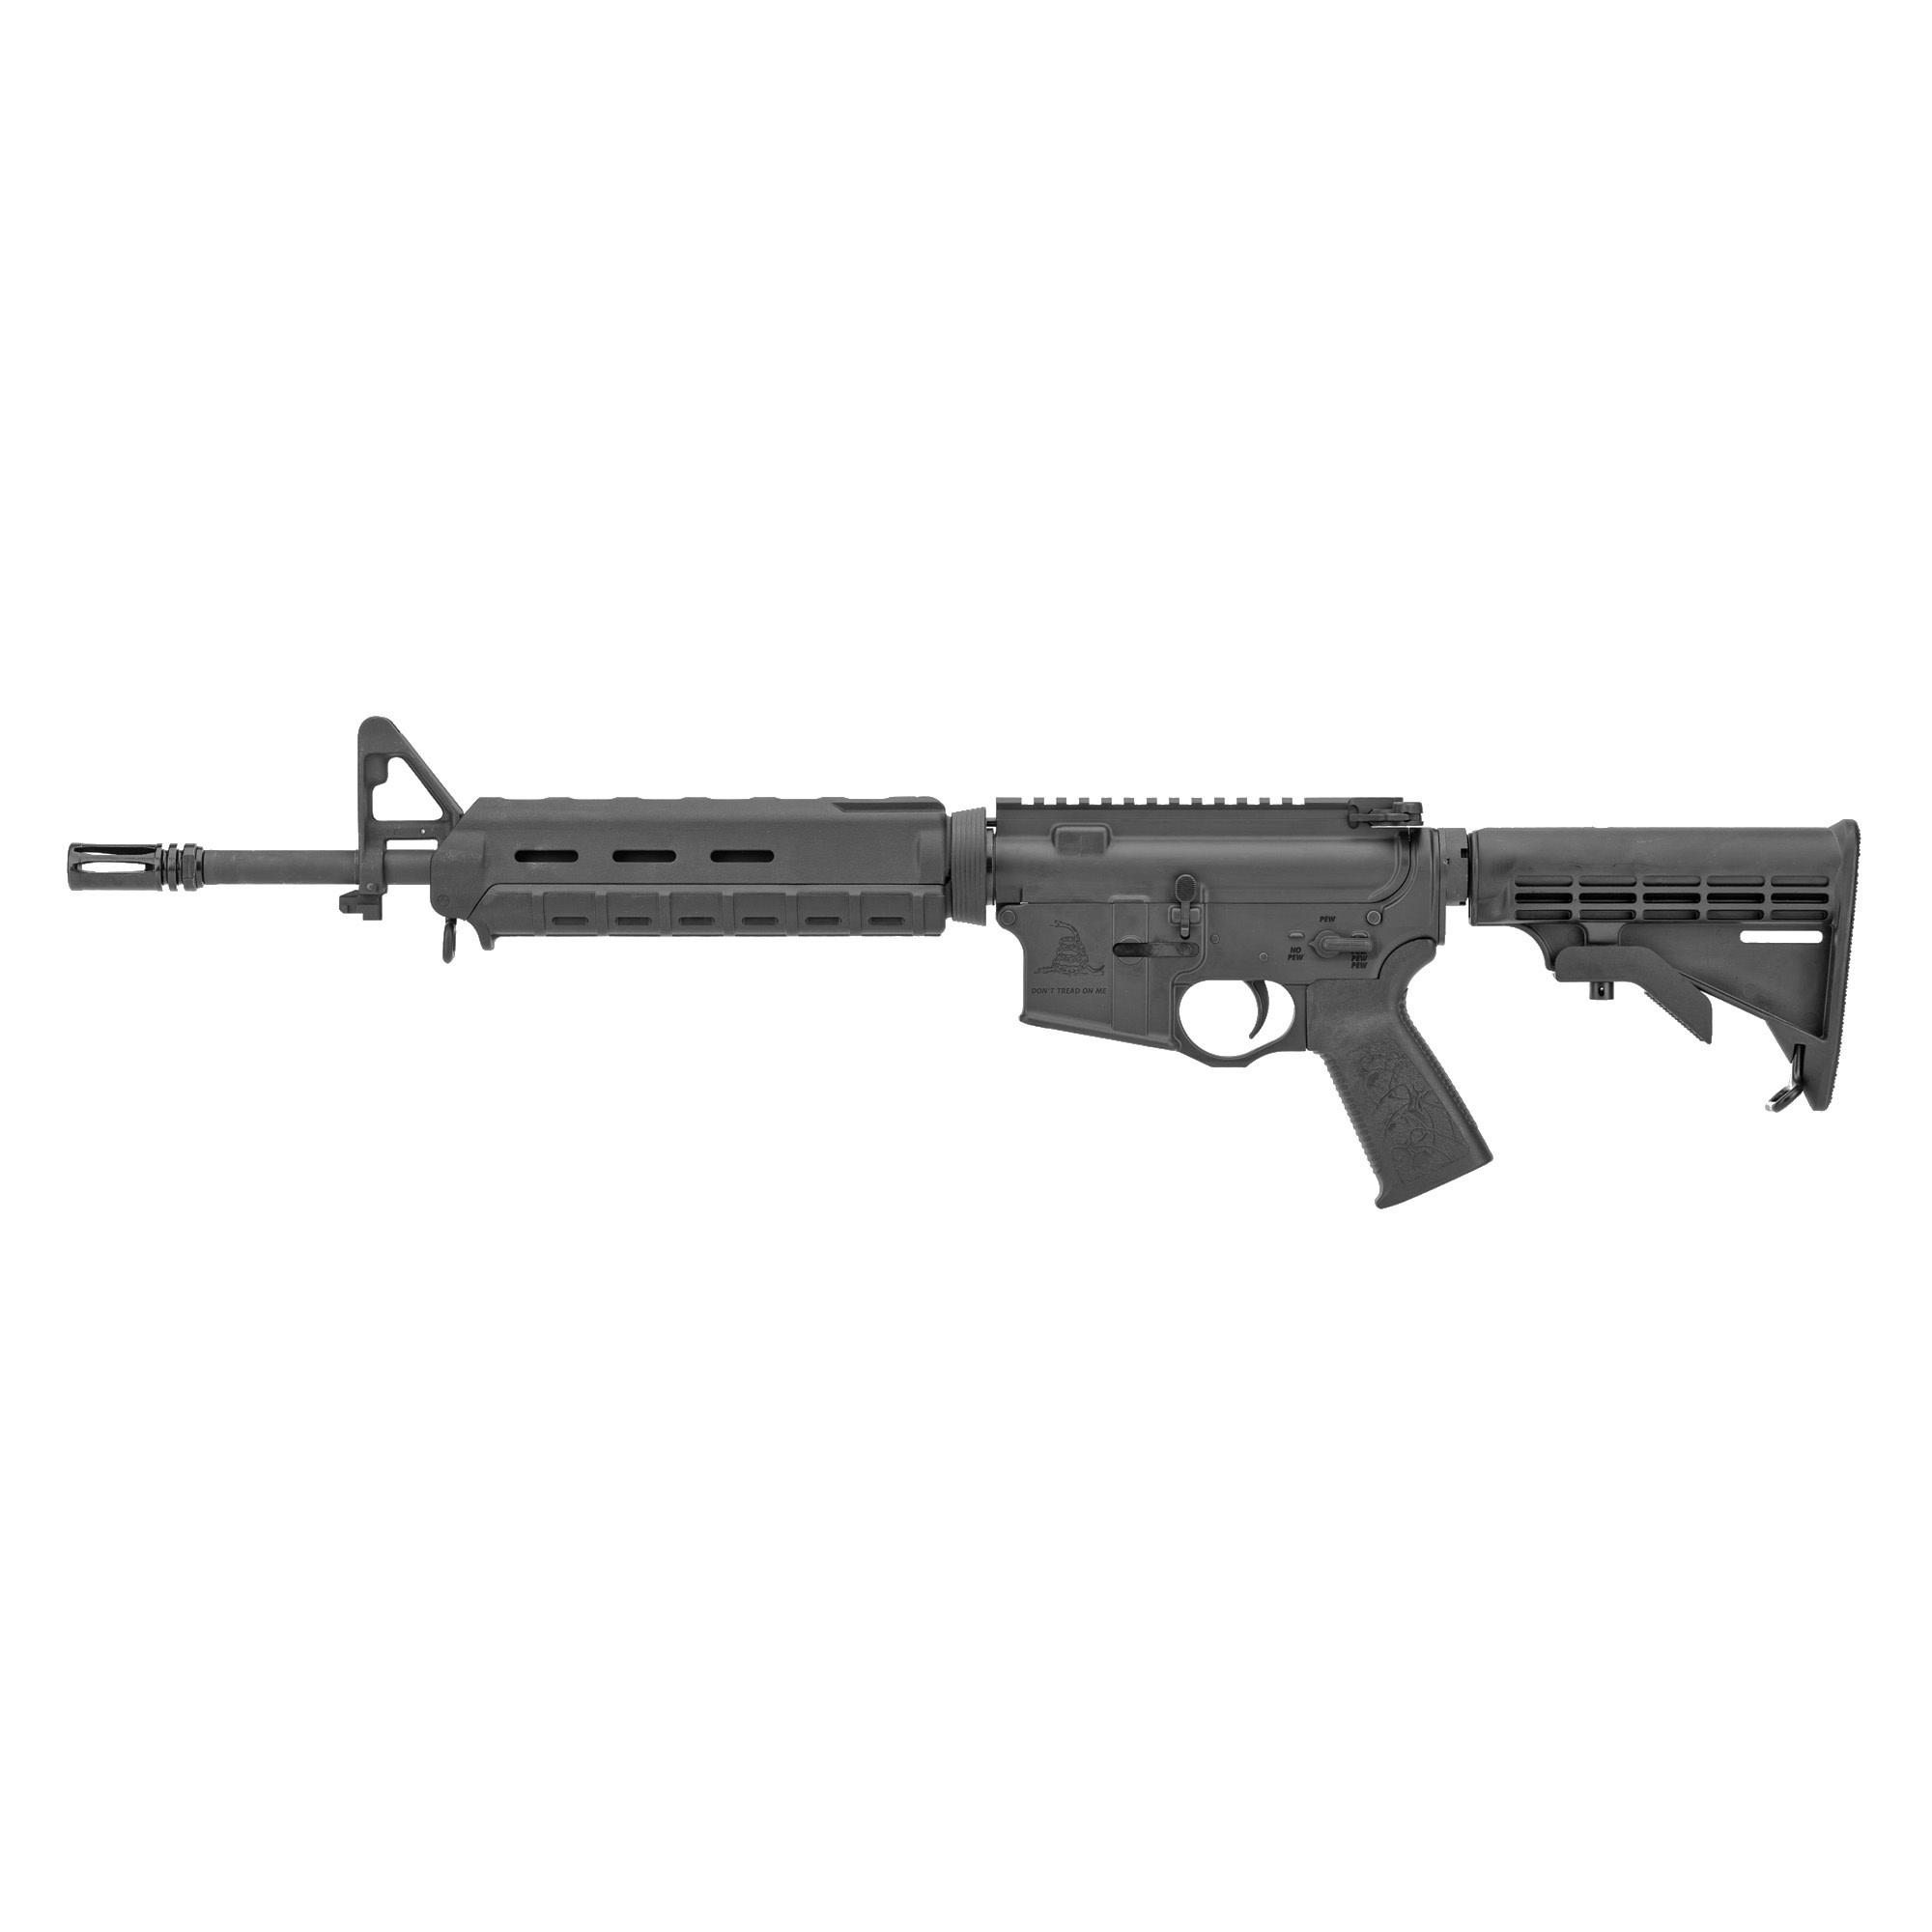 "Spike's Tactical Gadsden AR-15, 556/223, 14.5""(16"" OAL With Pinned Flash Hider), Mid-length Gas System, Cerakote Black, Black MOE Handguard, No Mag"